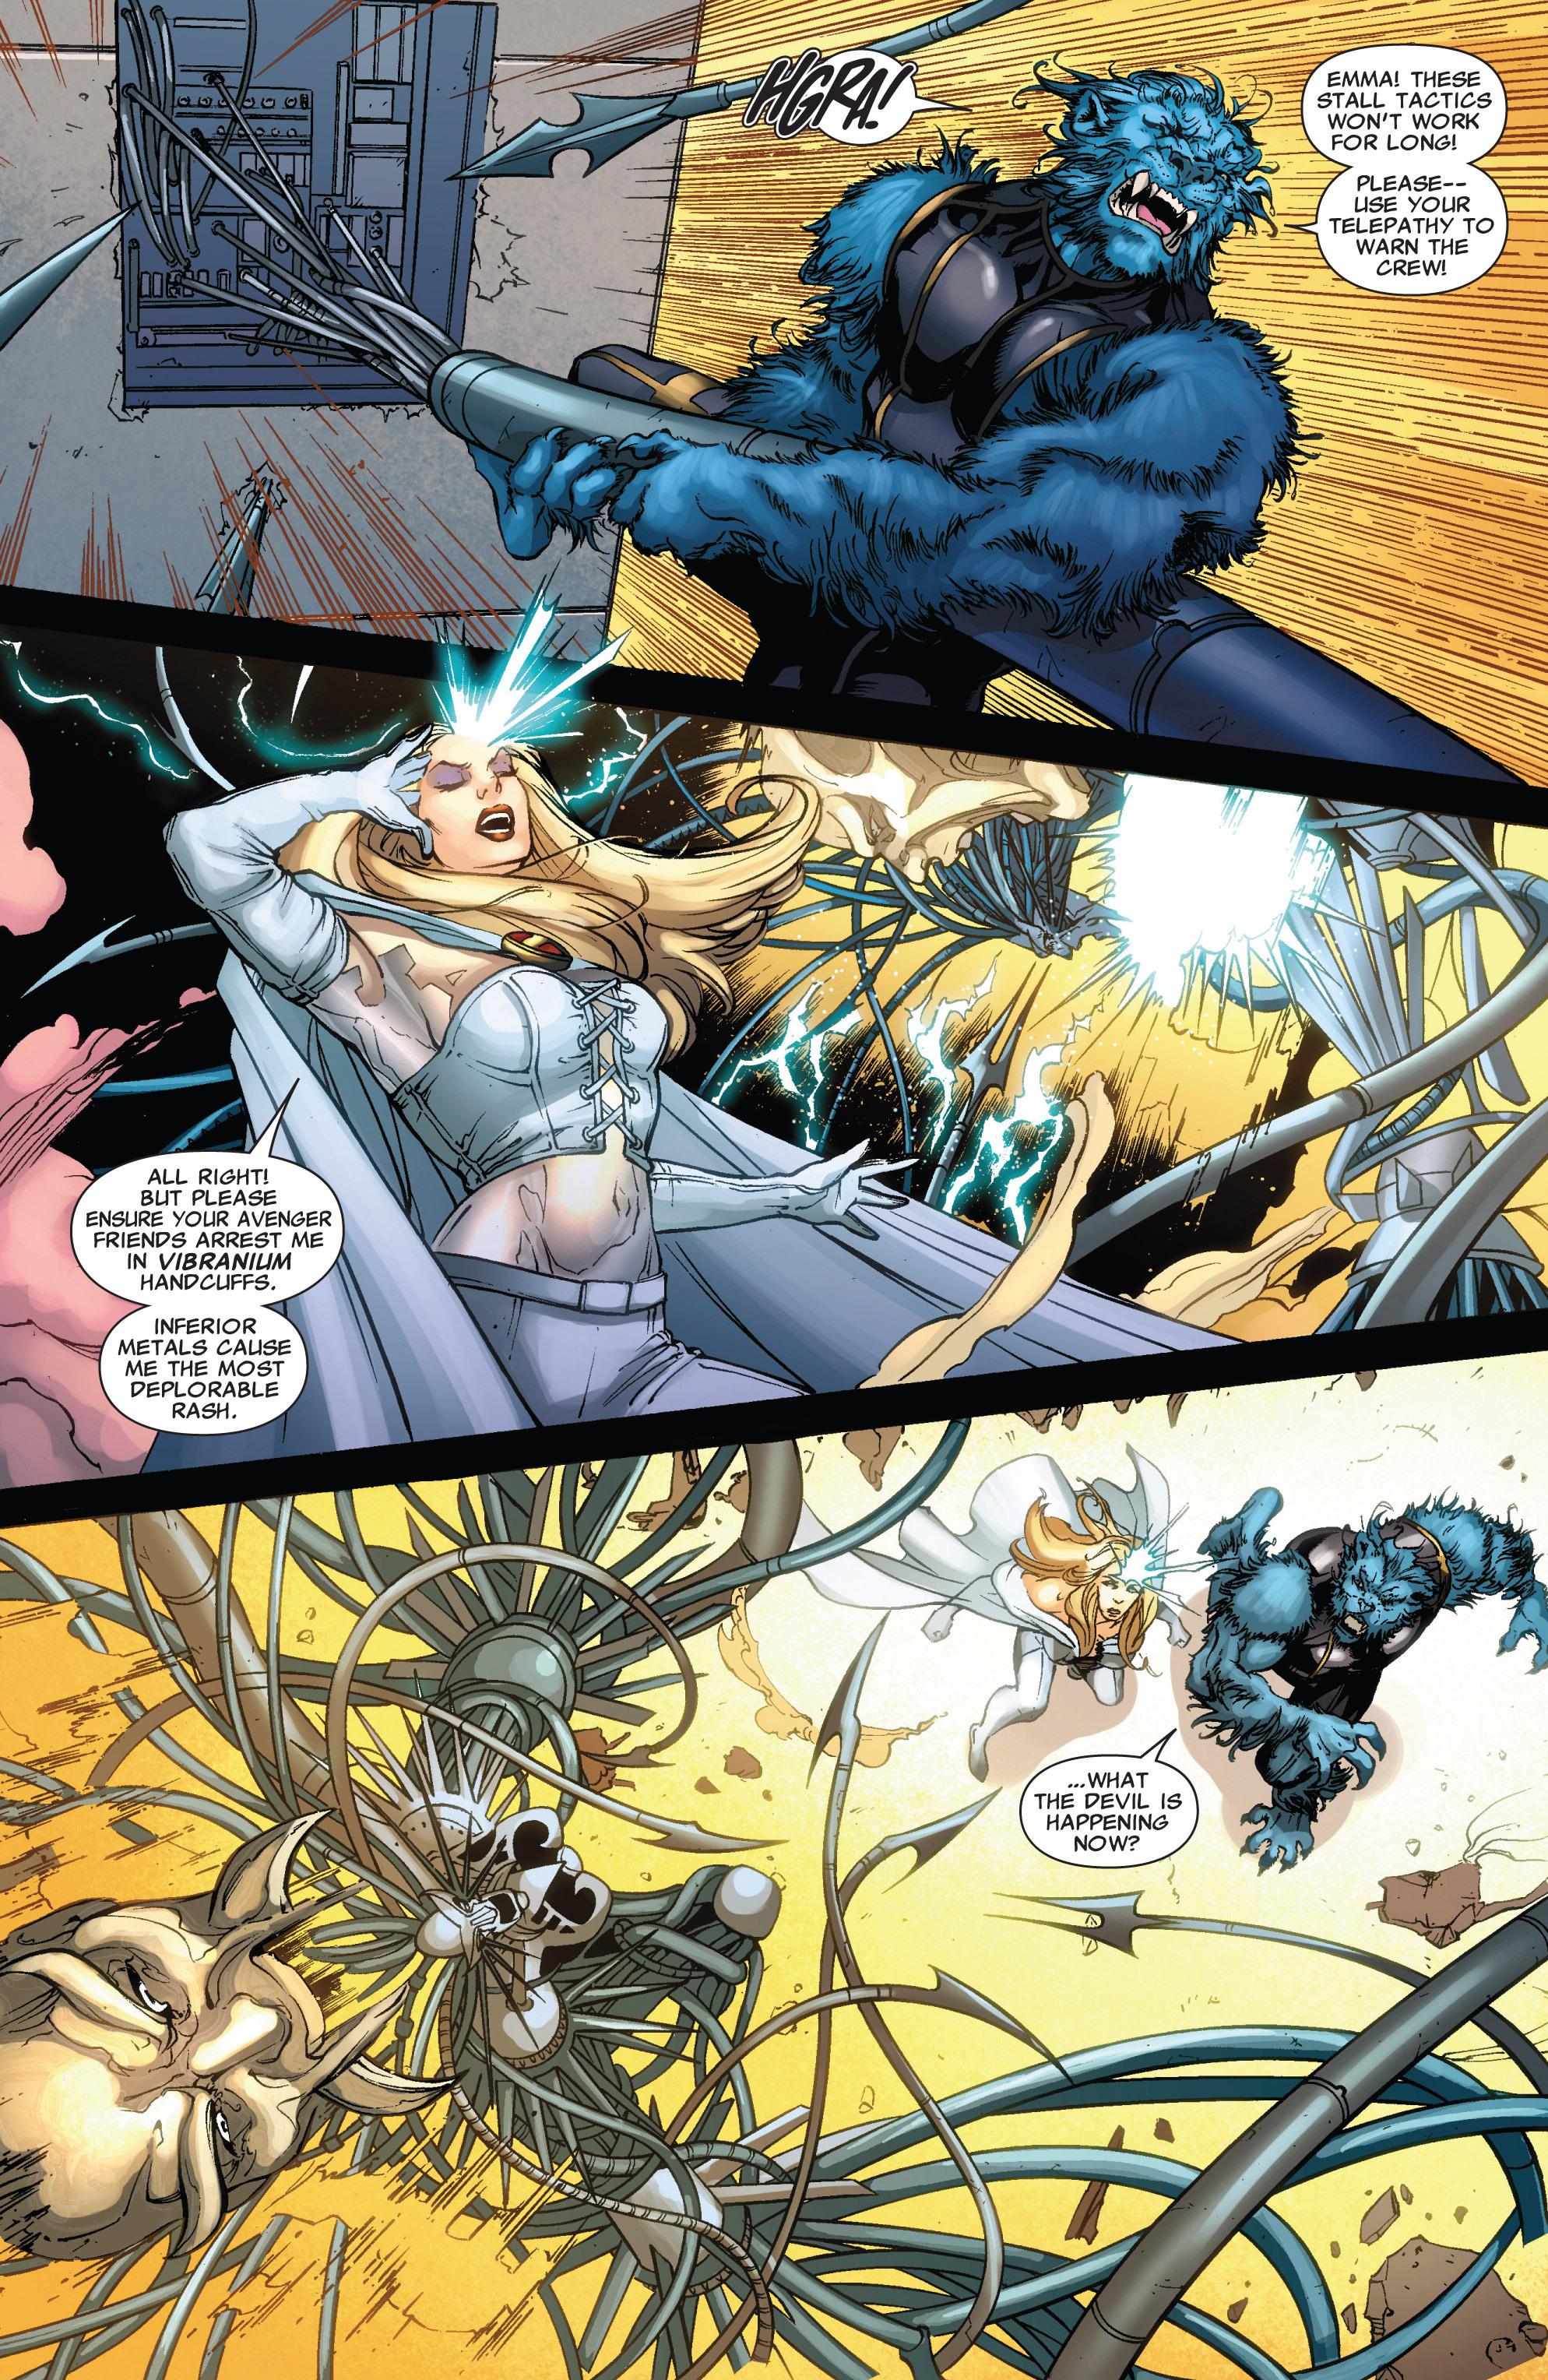 Read online Astonishing X-Men (2004) comic -  Issue #43 - 19